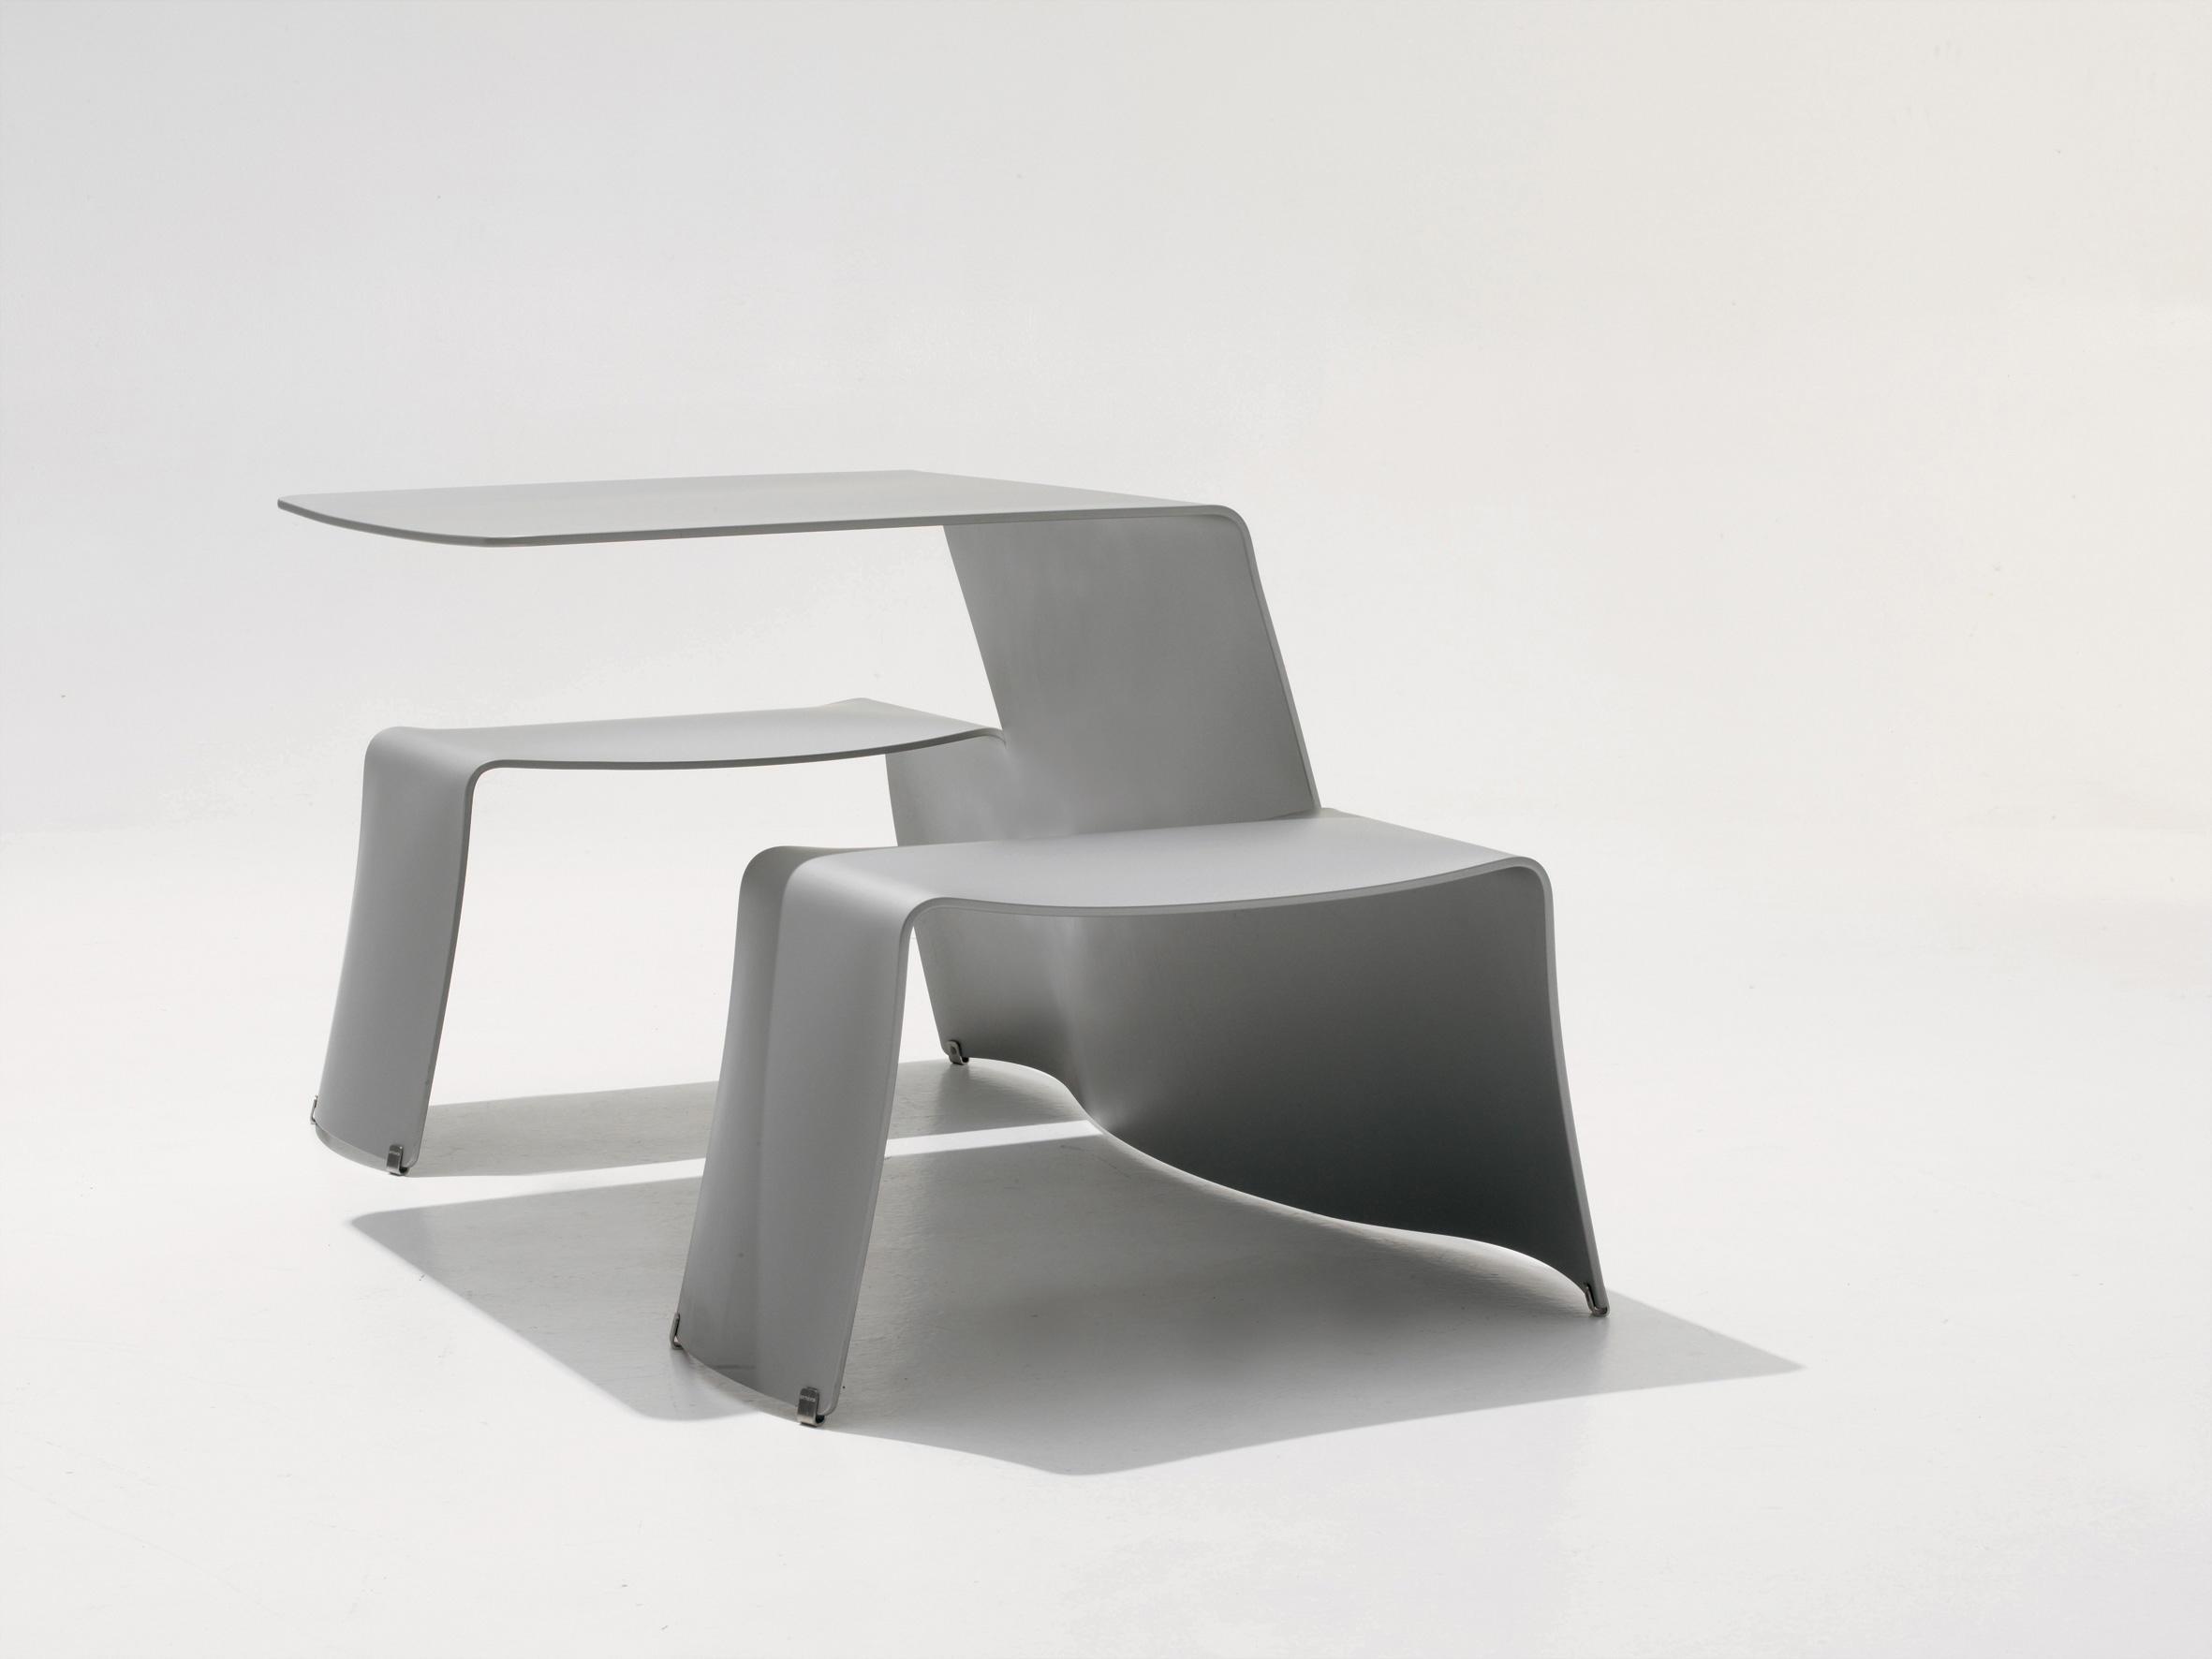 Picnik by extremis | Chairs Picnik by extremis | Chairs ... & PICNIK - Chairs from extremis | Architonic